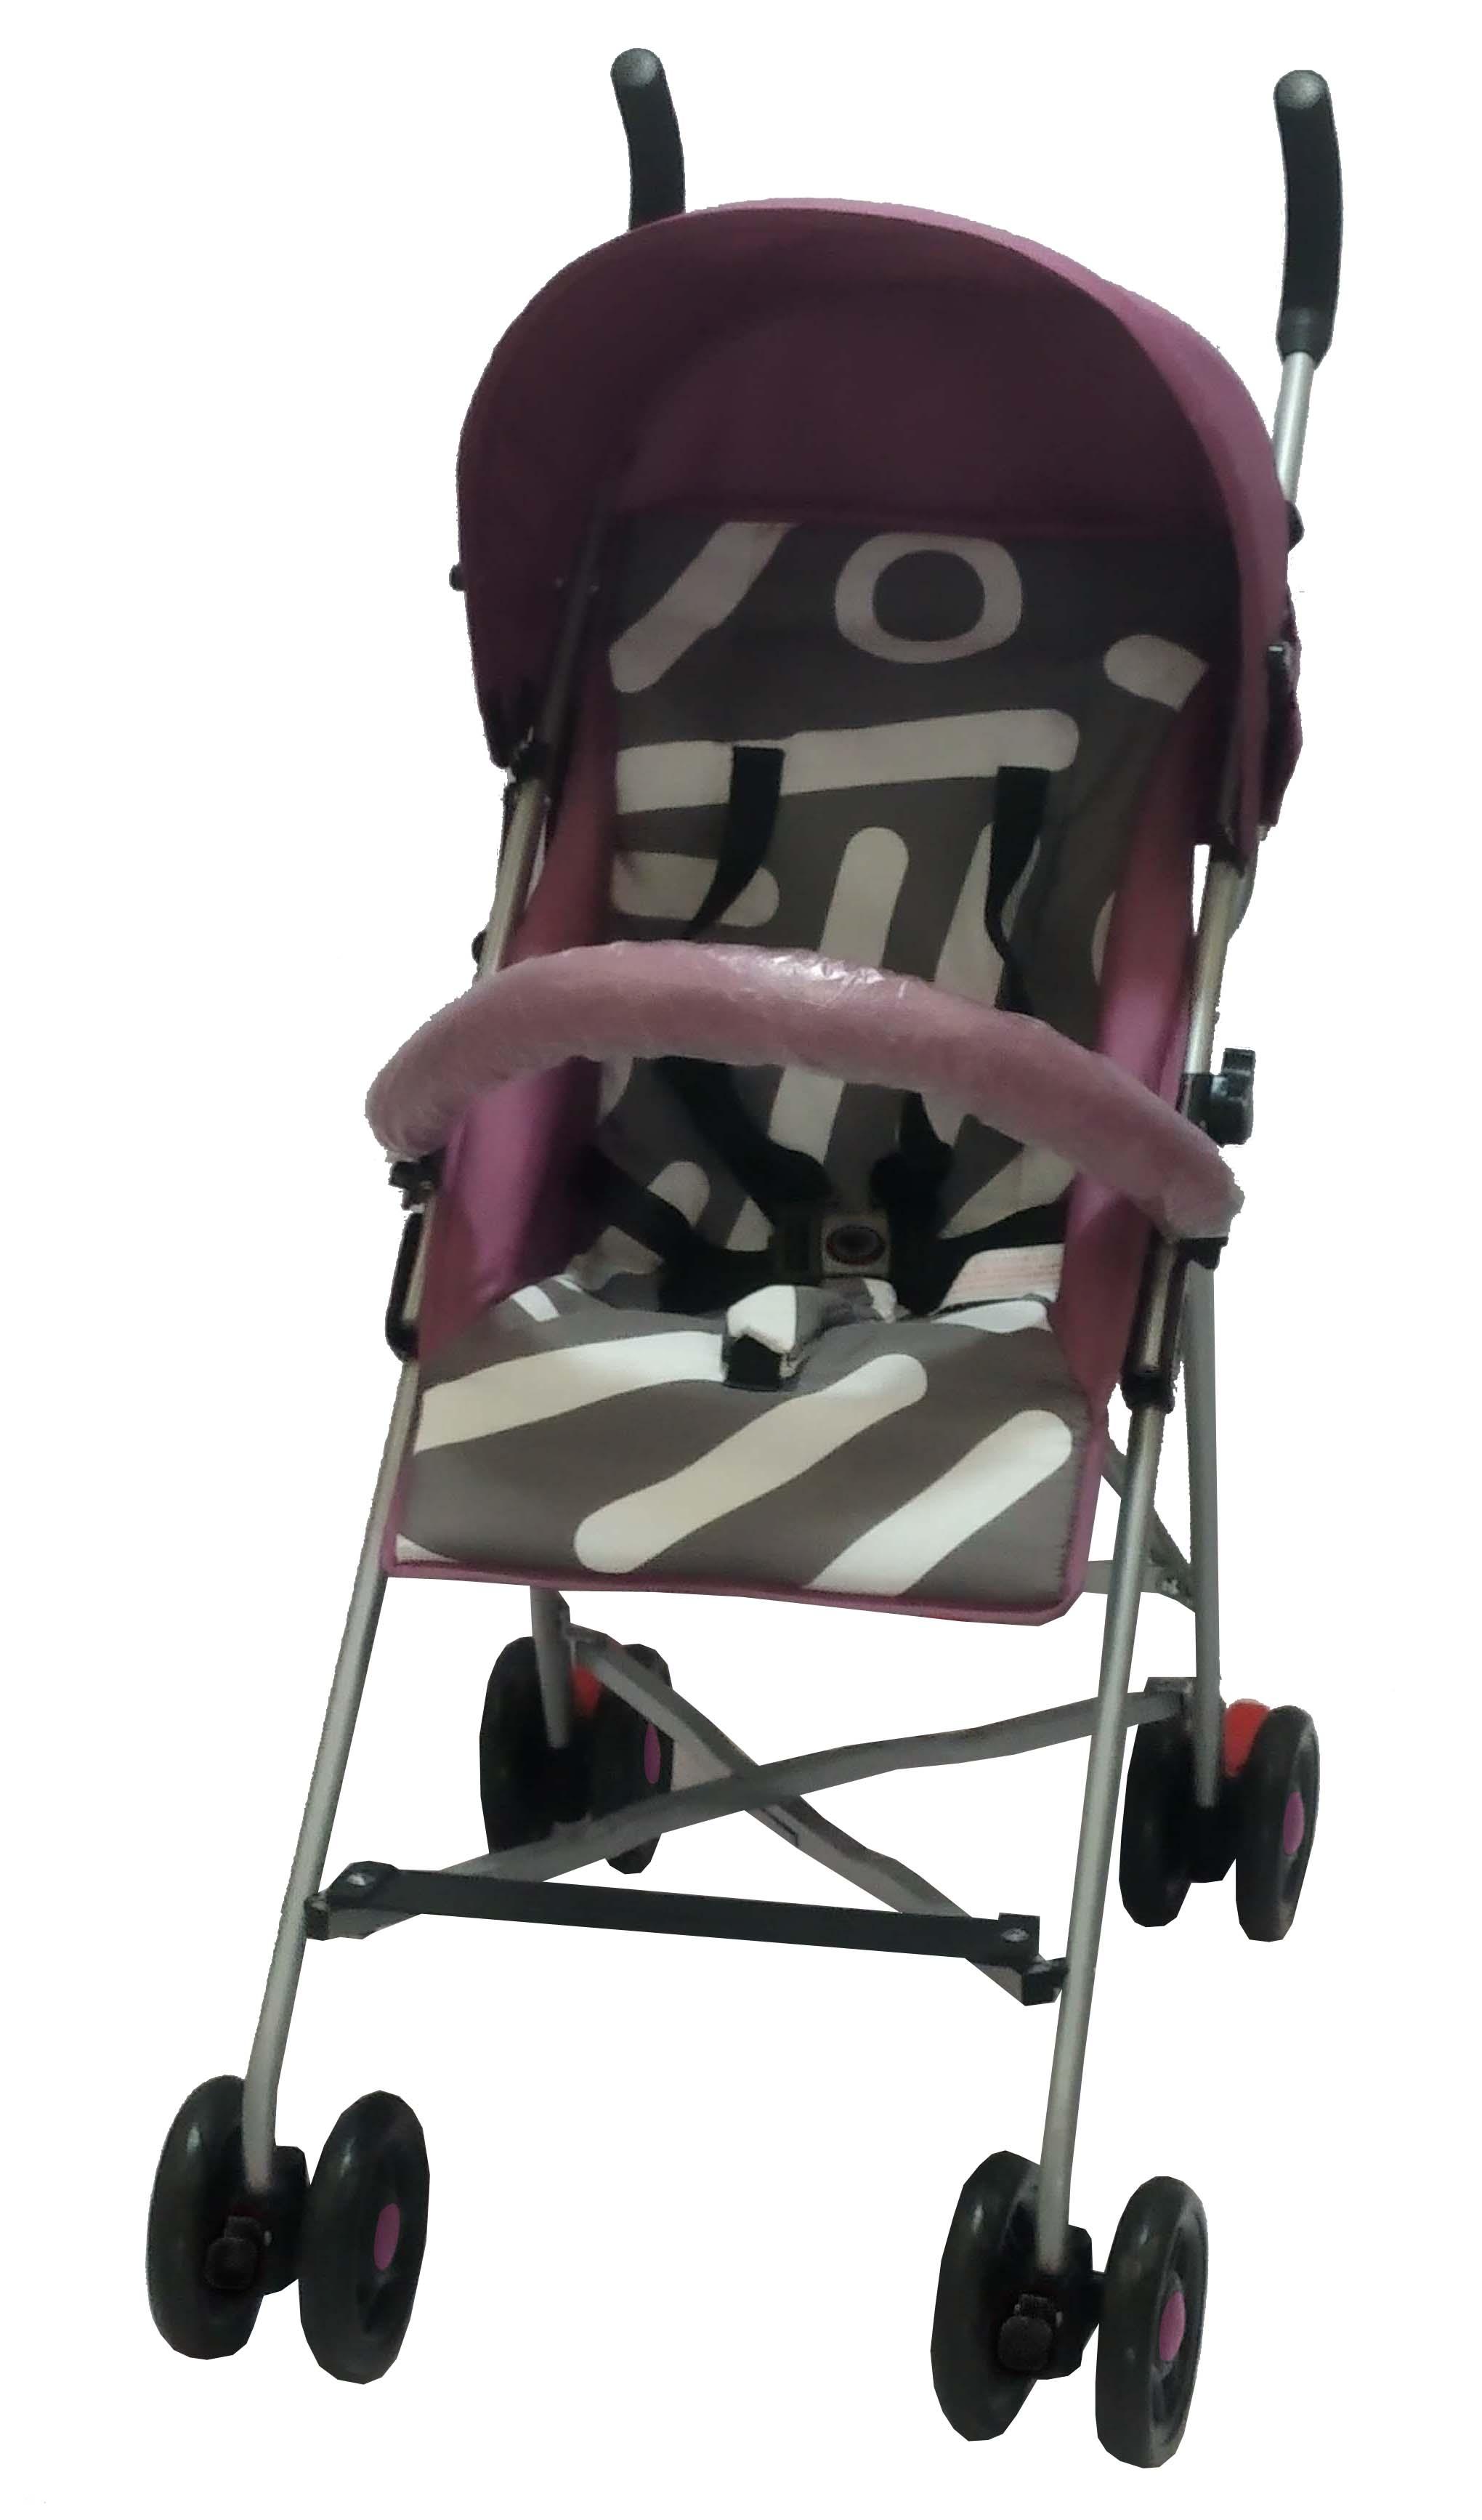 Прогулочная коляска Parusok Evo Pro розовый